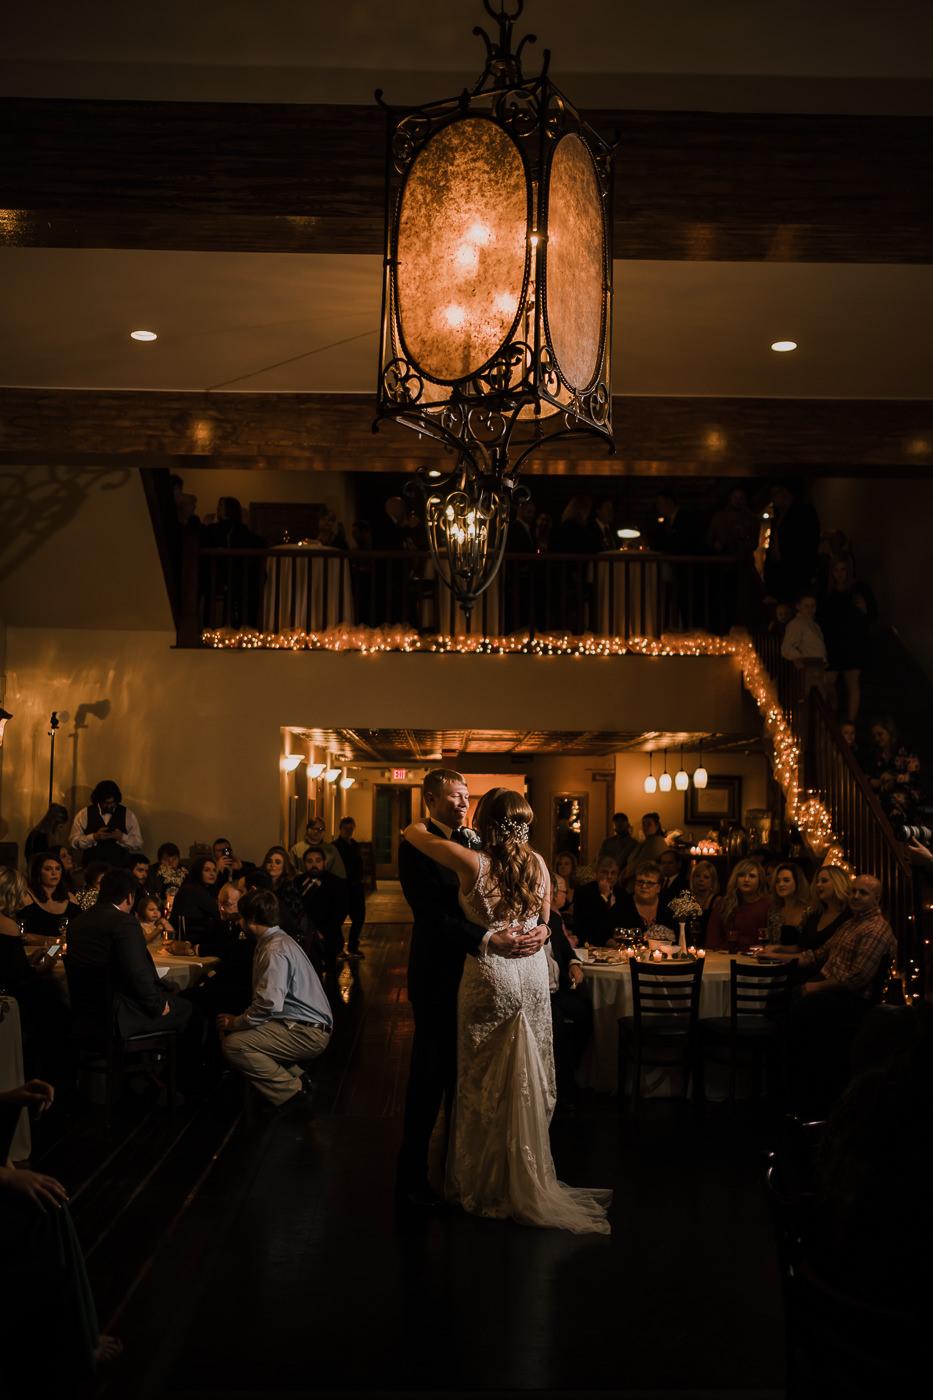 rogers.arkansas.weddingphotos.©2018mileswittboyer-34.jpg